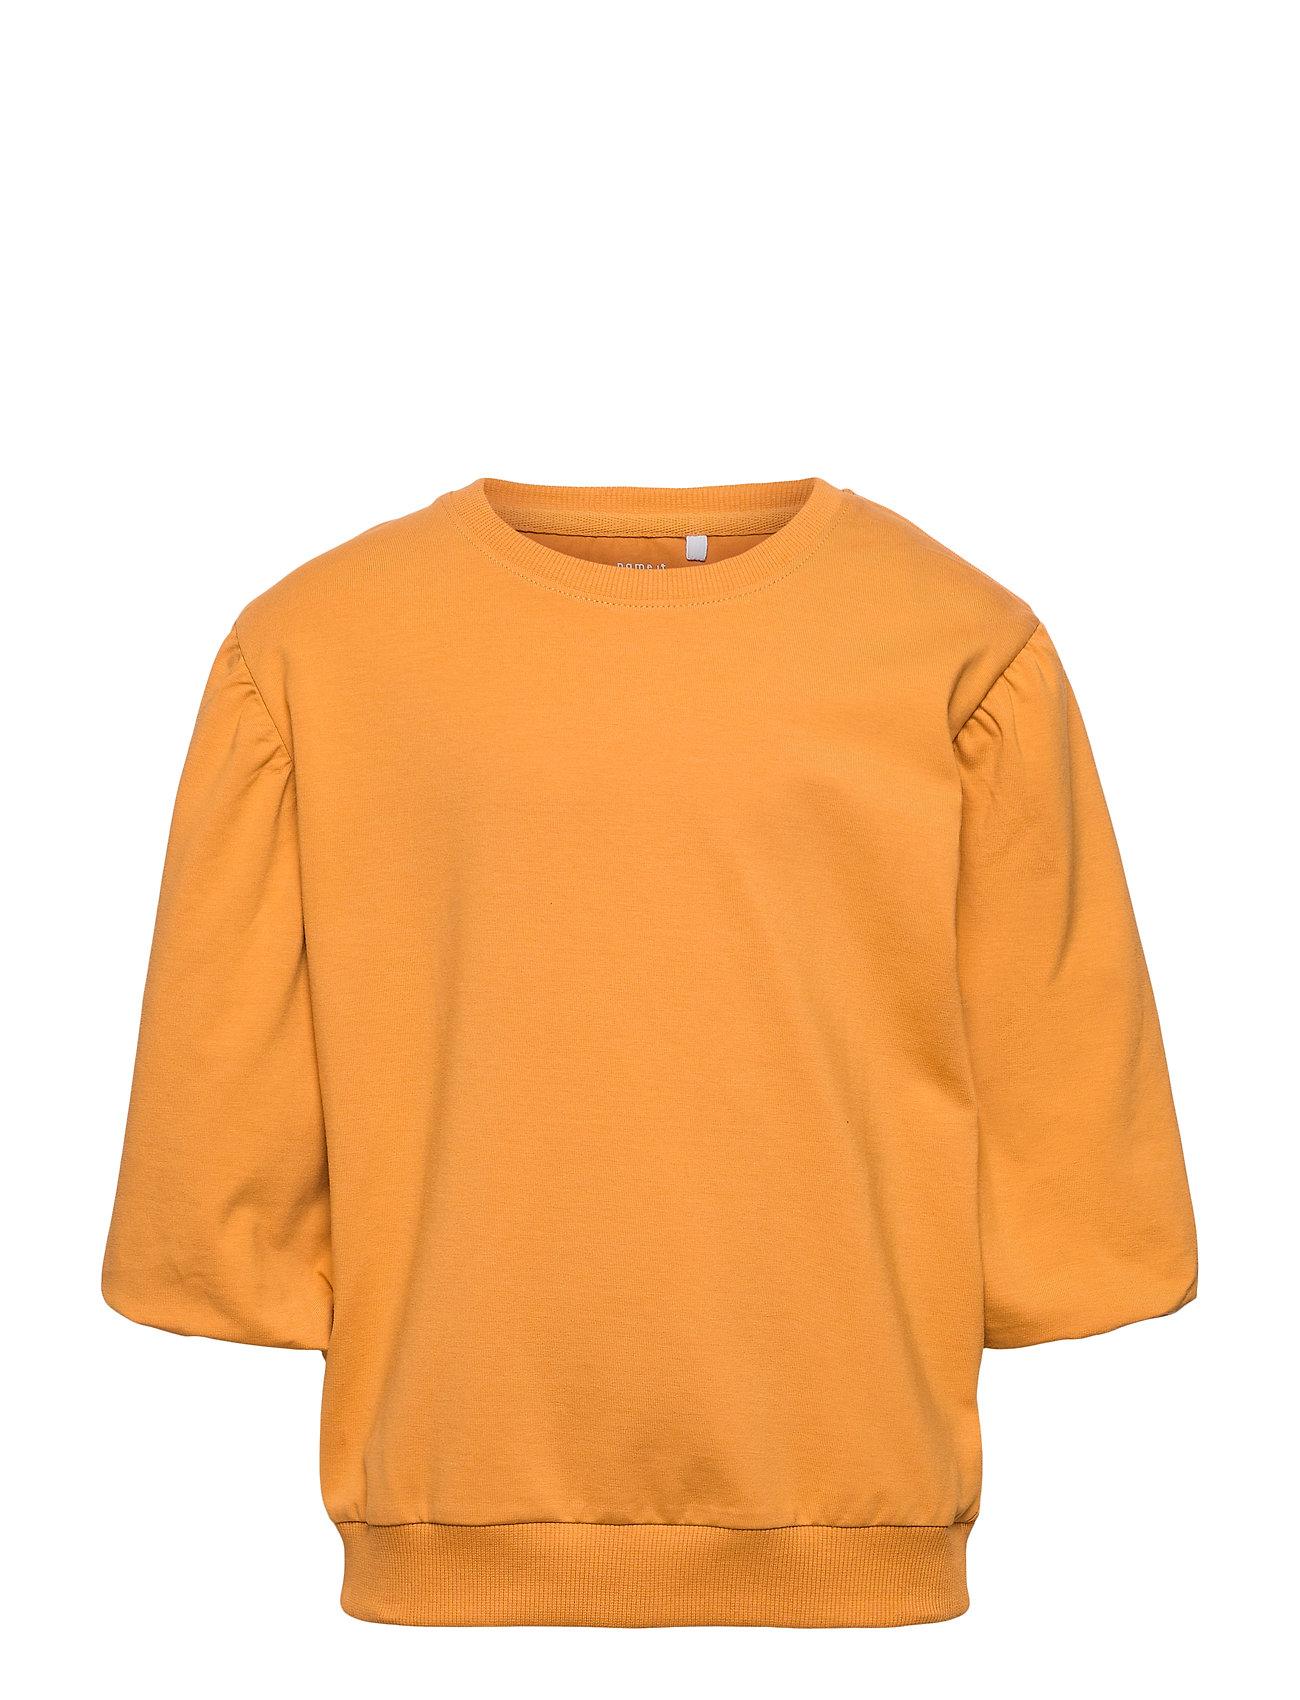 Image of Nkftalitha Ss Top Sweatshirt Trøje Gul Name It (3479931673)